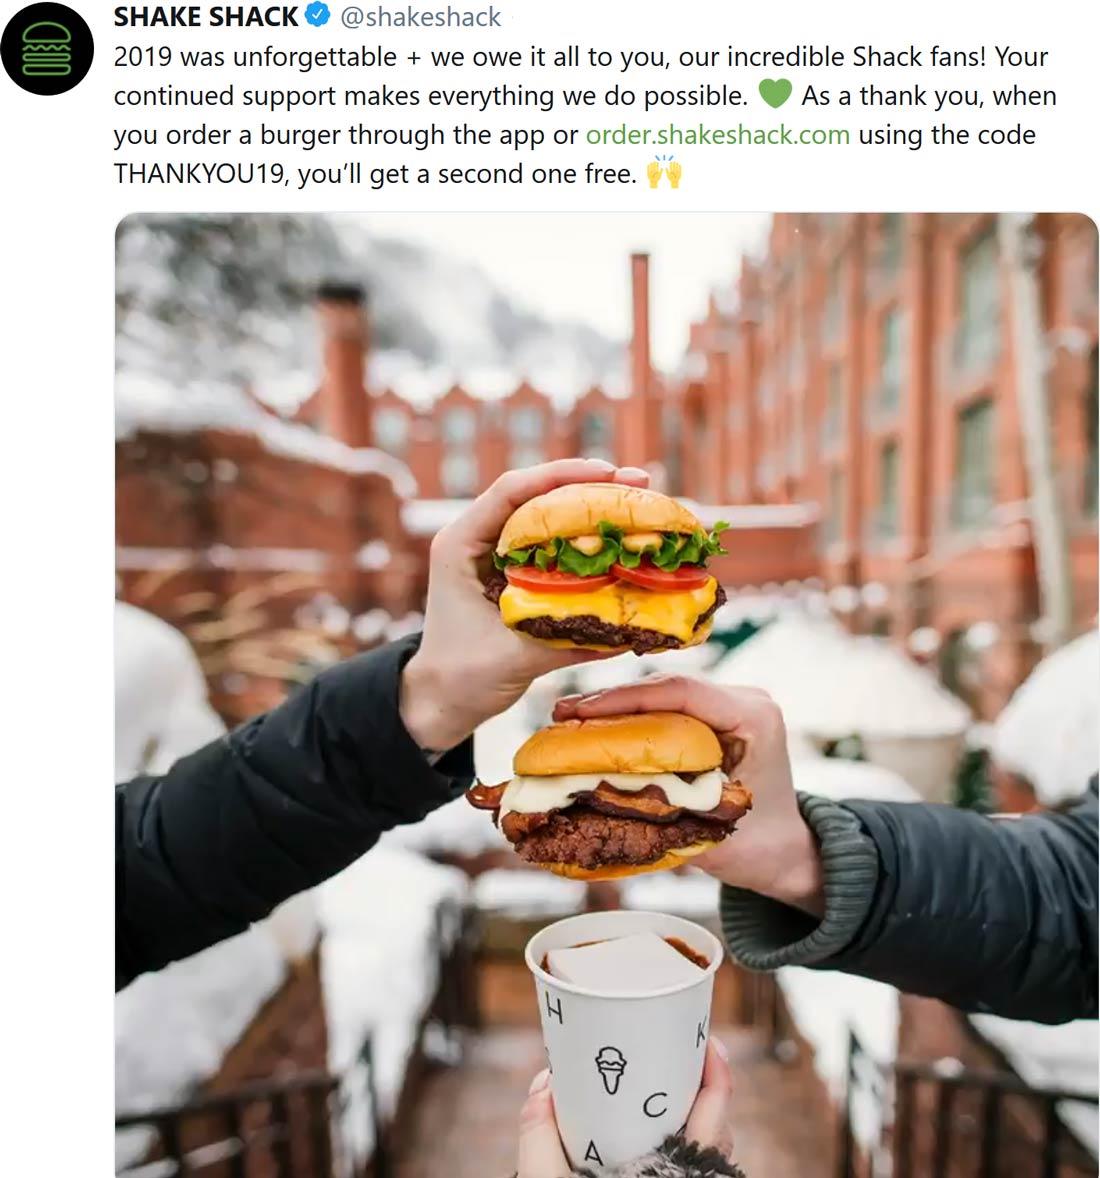 Shake Shack Coupon January 2020 Second burger free at Shake Shack via promo code THANKYOU19